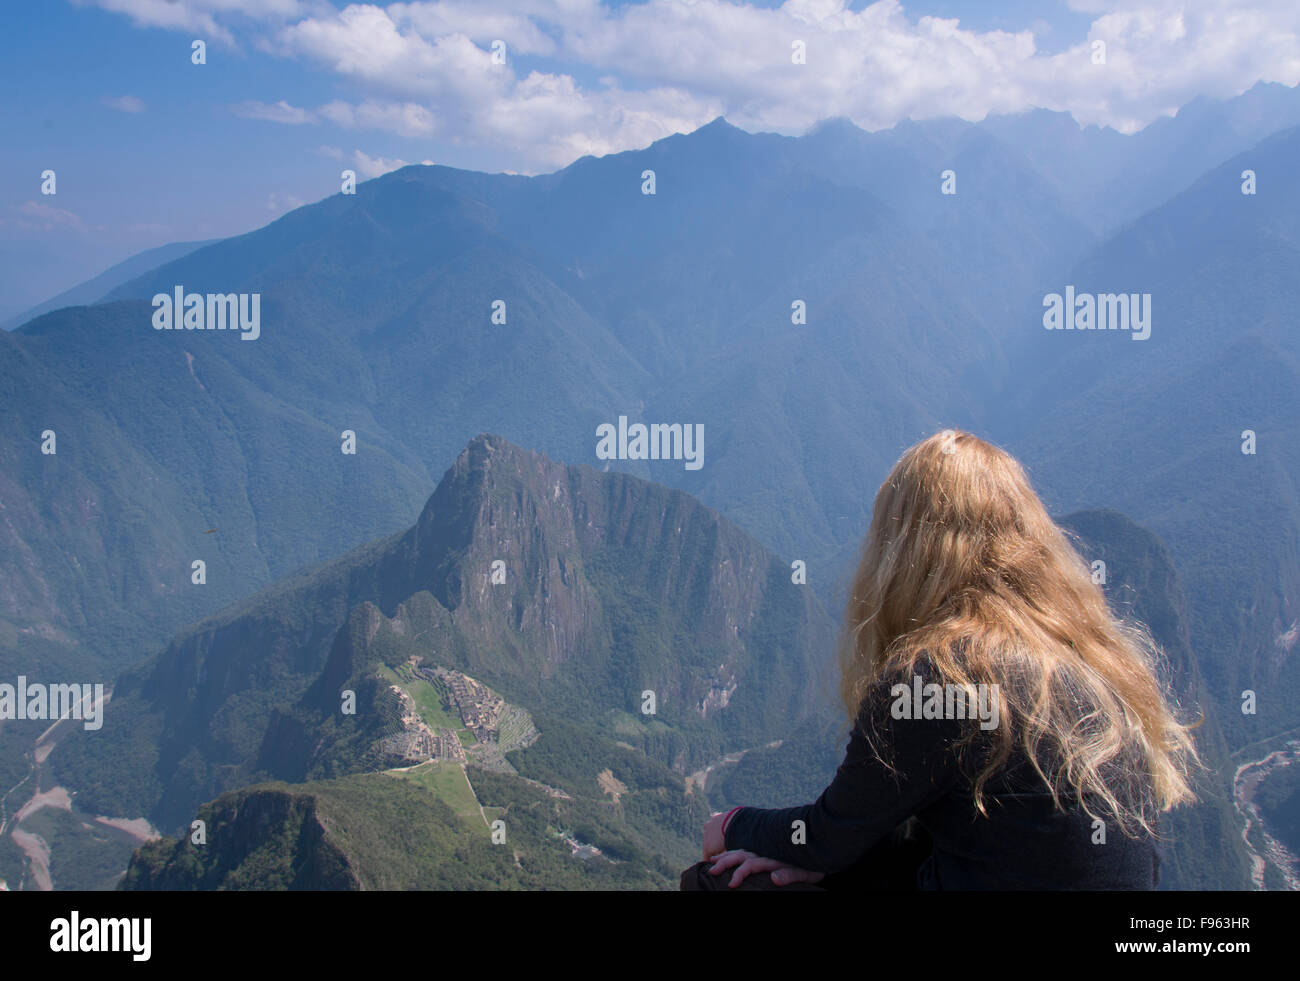 Viajeros en el mirador de alta montana Machu Picchu, Perú Imagen De Stock